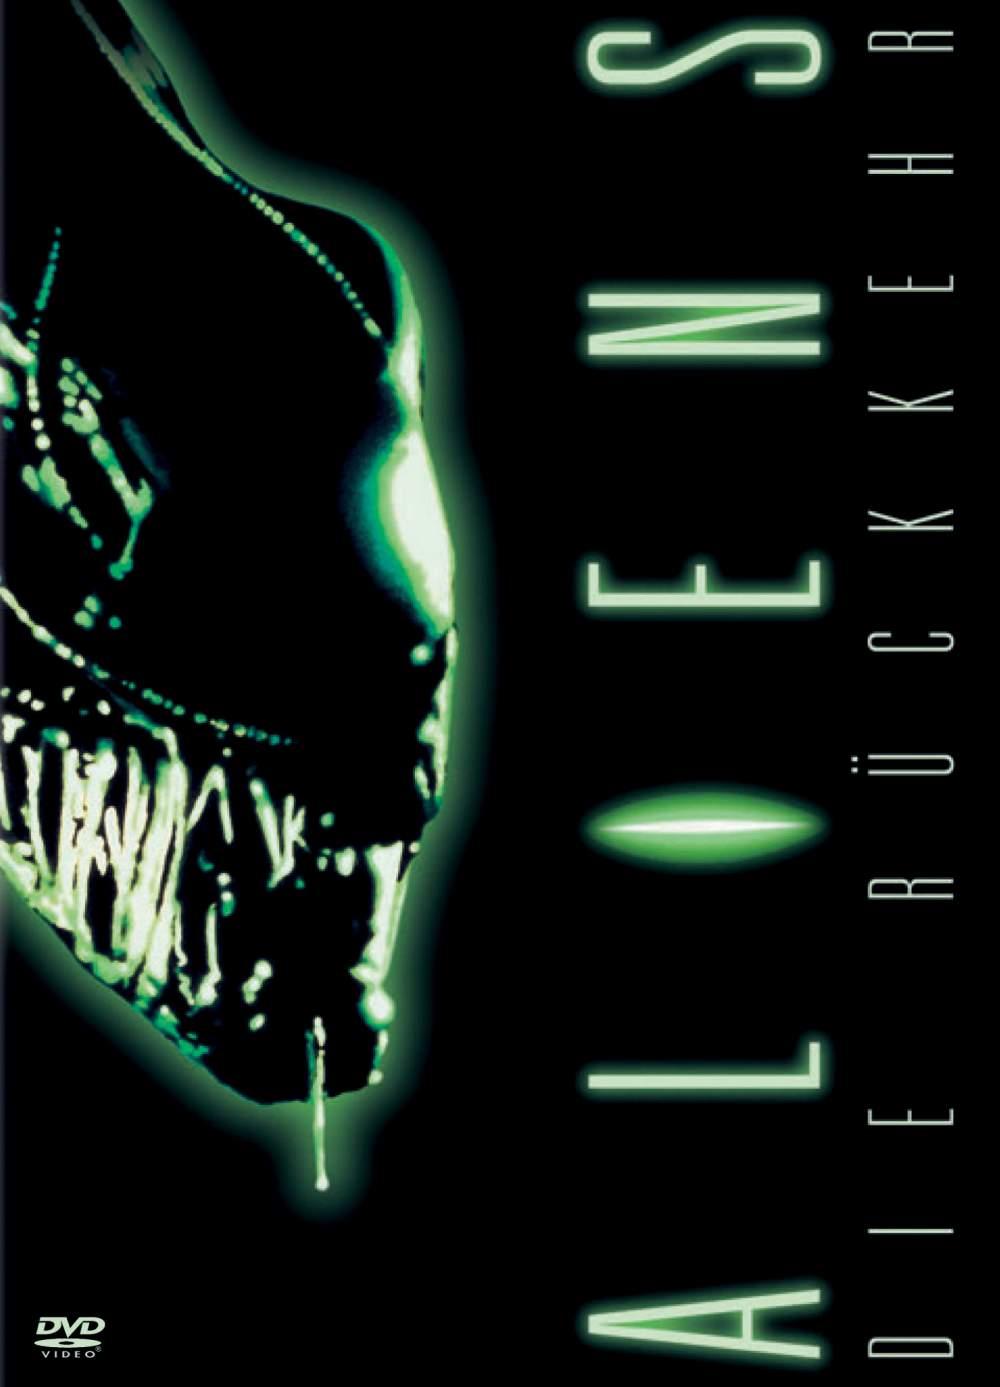 aliens - die rГјckkehr